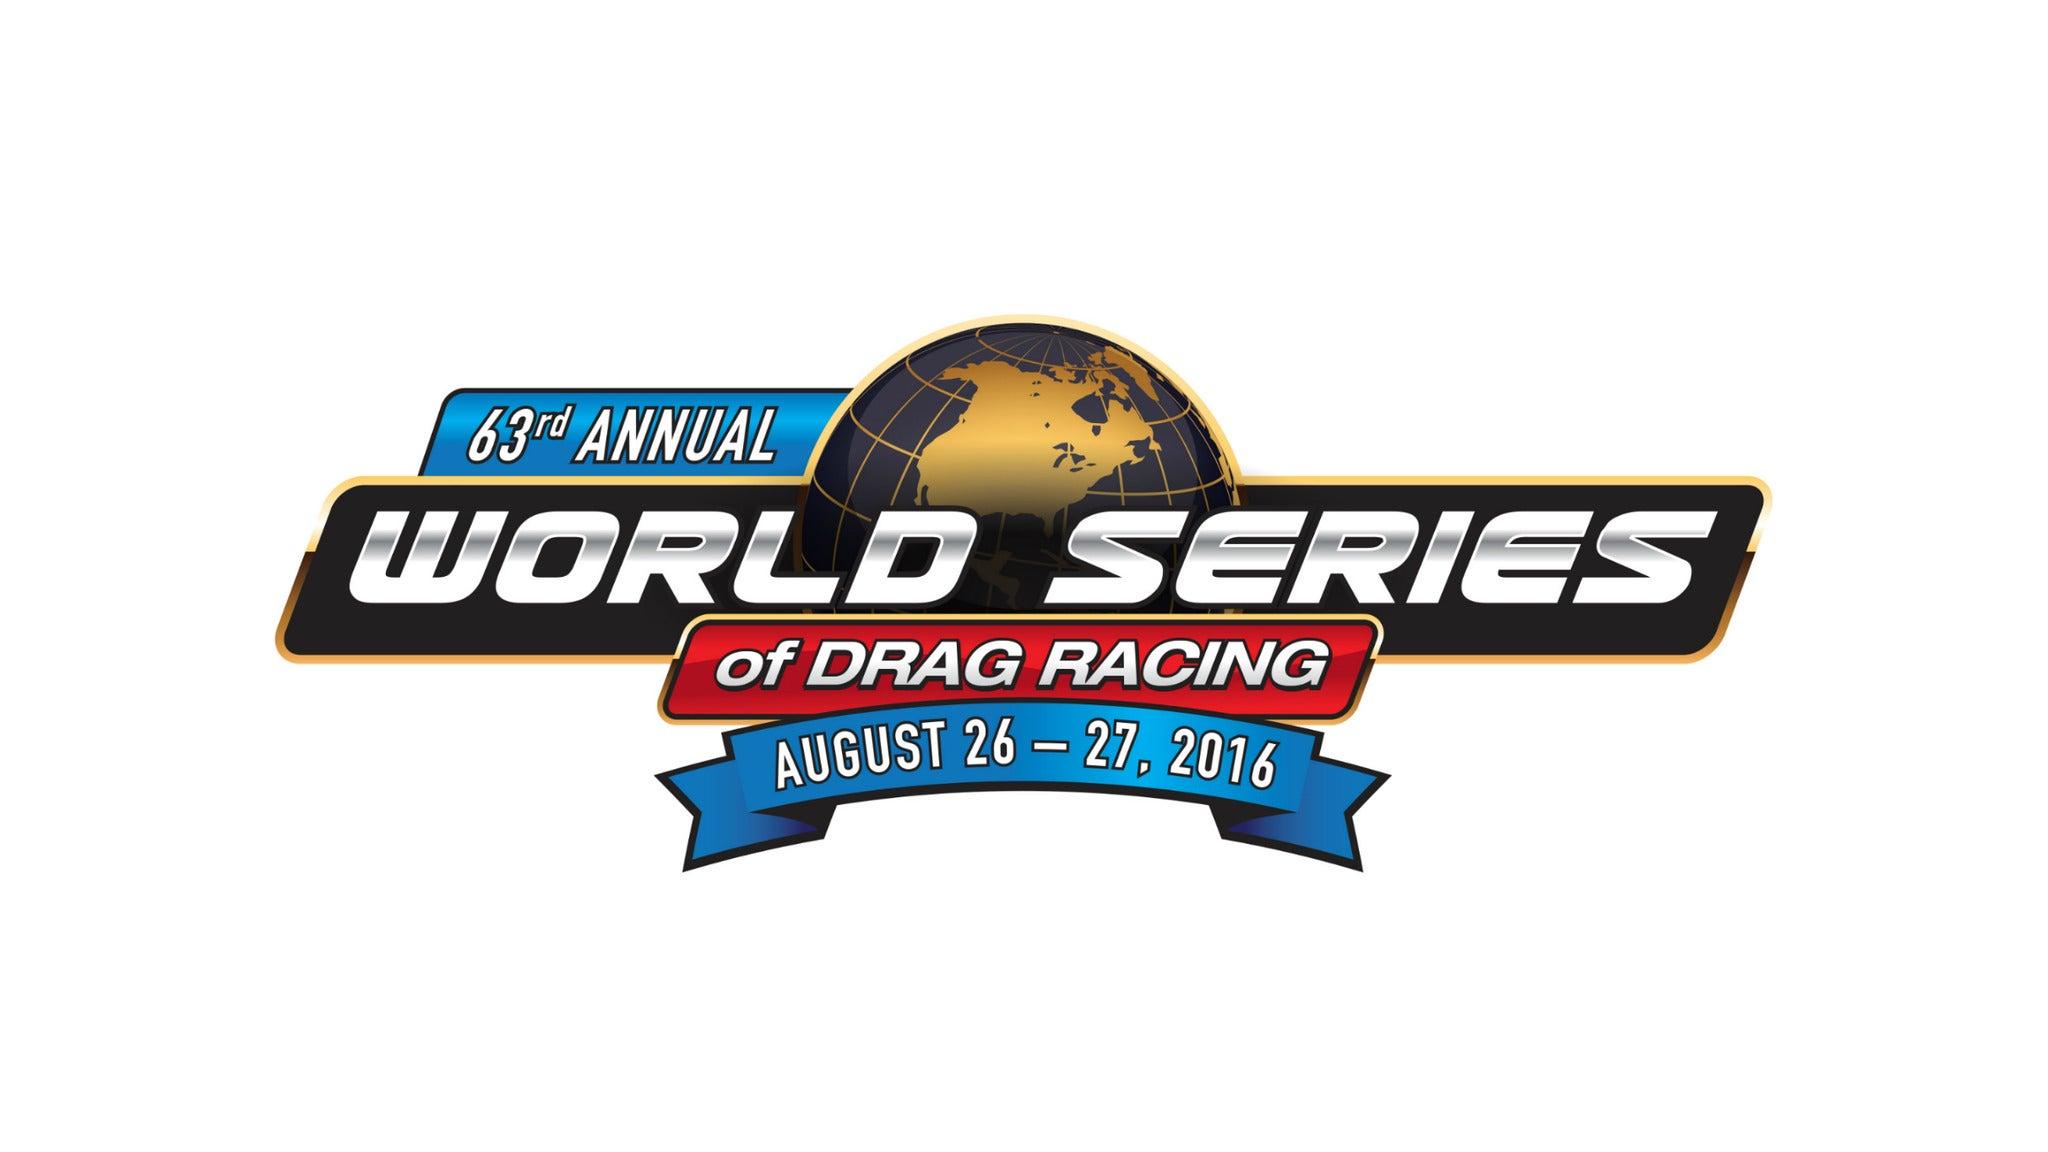 World Series of Drag Racing : Friday